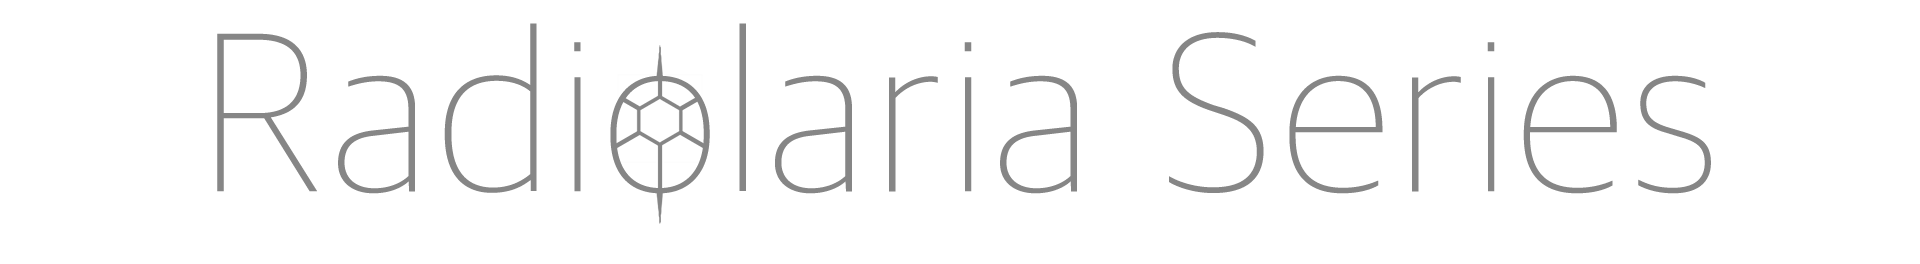 logo_radiolaria.png